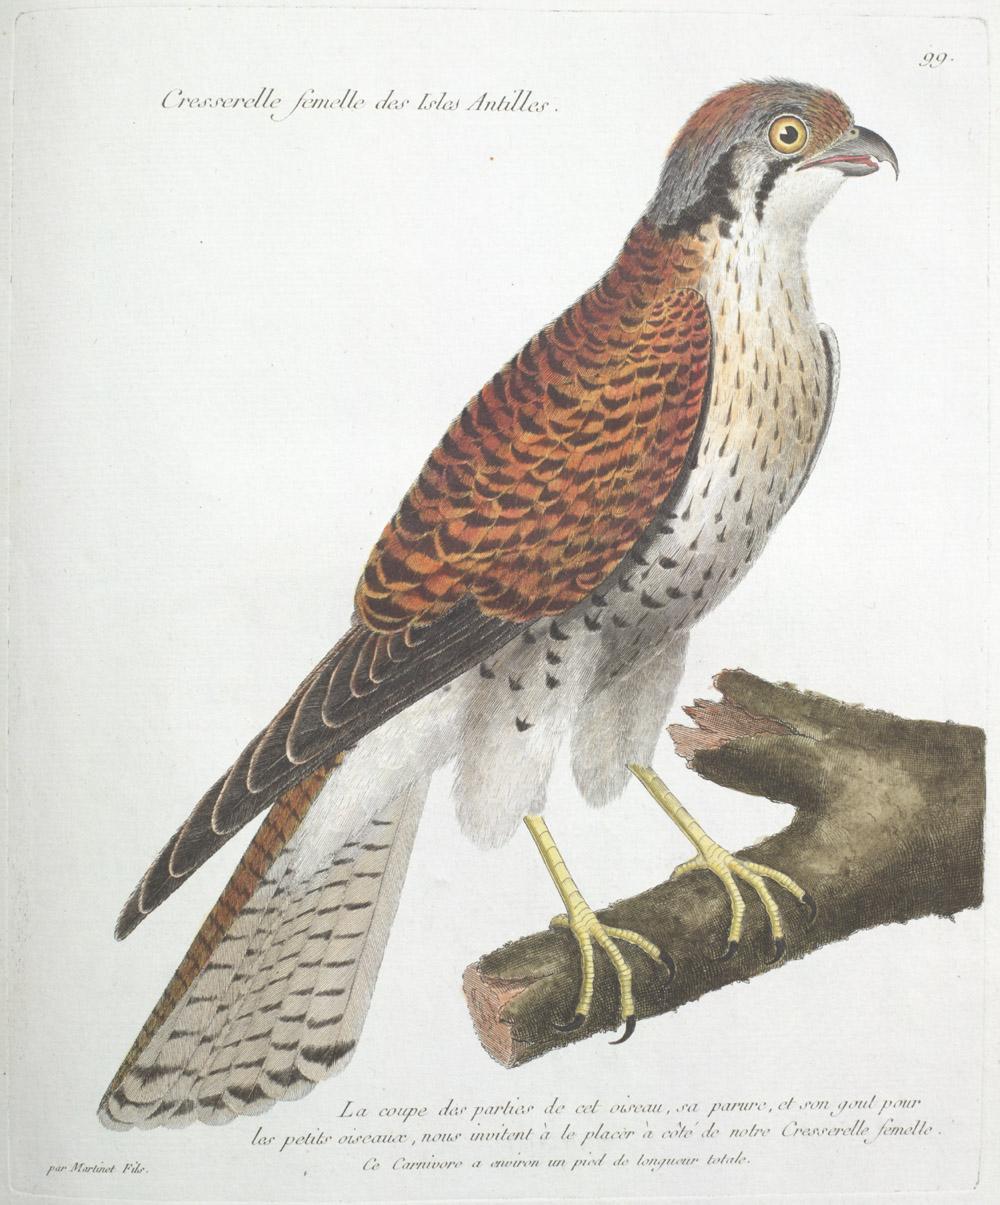 Plate 99: Cresserelle Femelle des Isles Antilles,  Image number:SIL13-1-203b